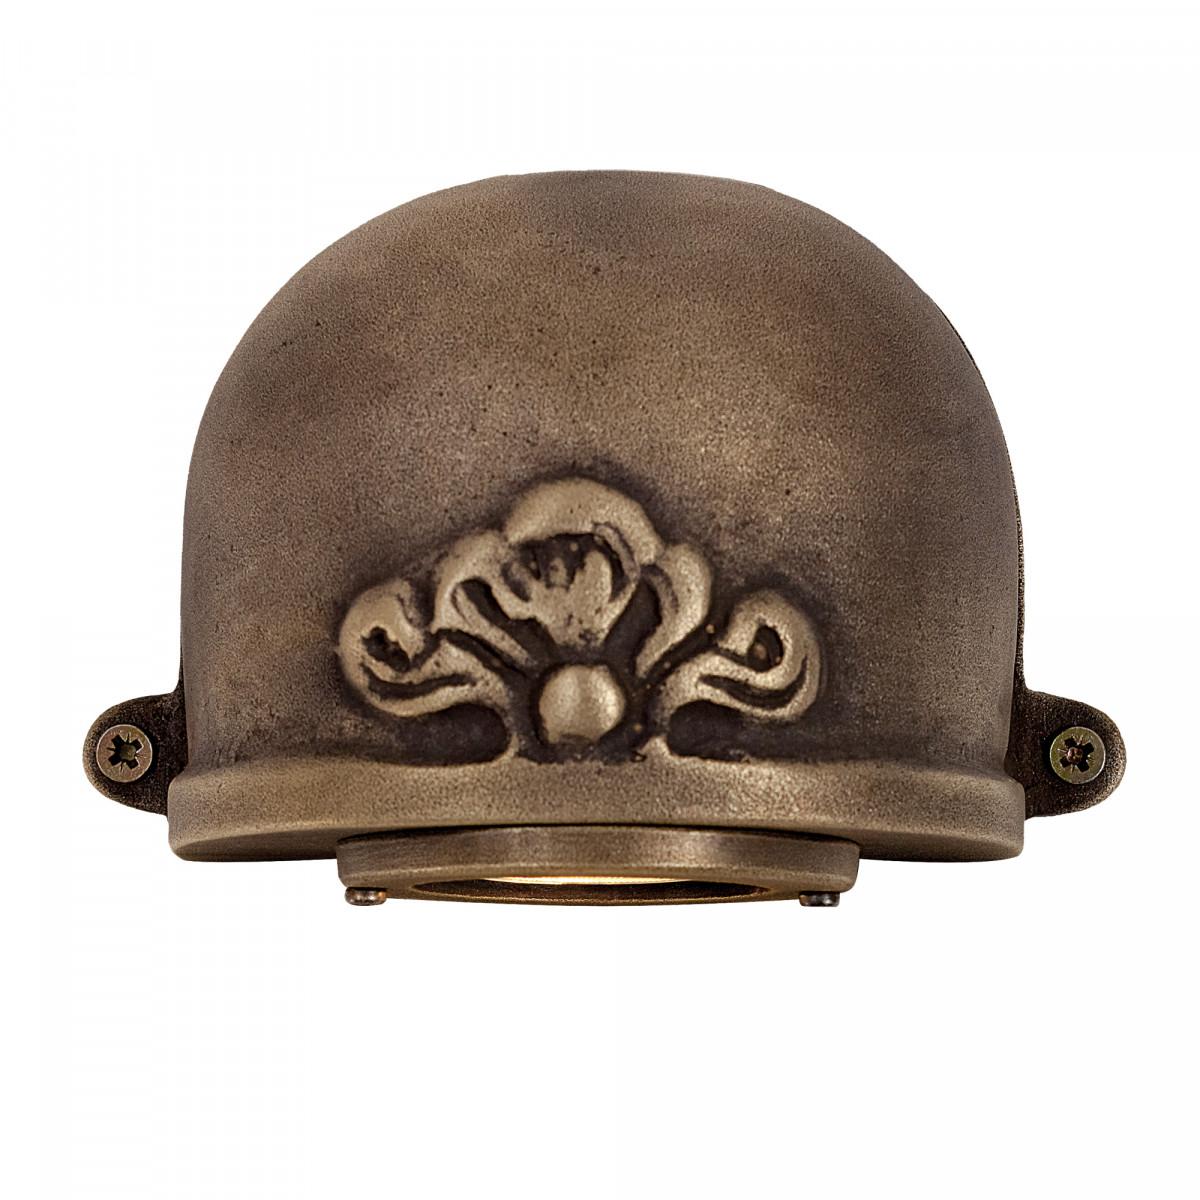 Downlighter Alba wandspot brons - KS Verlichting